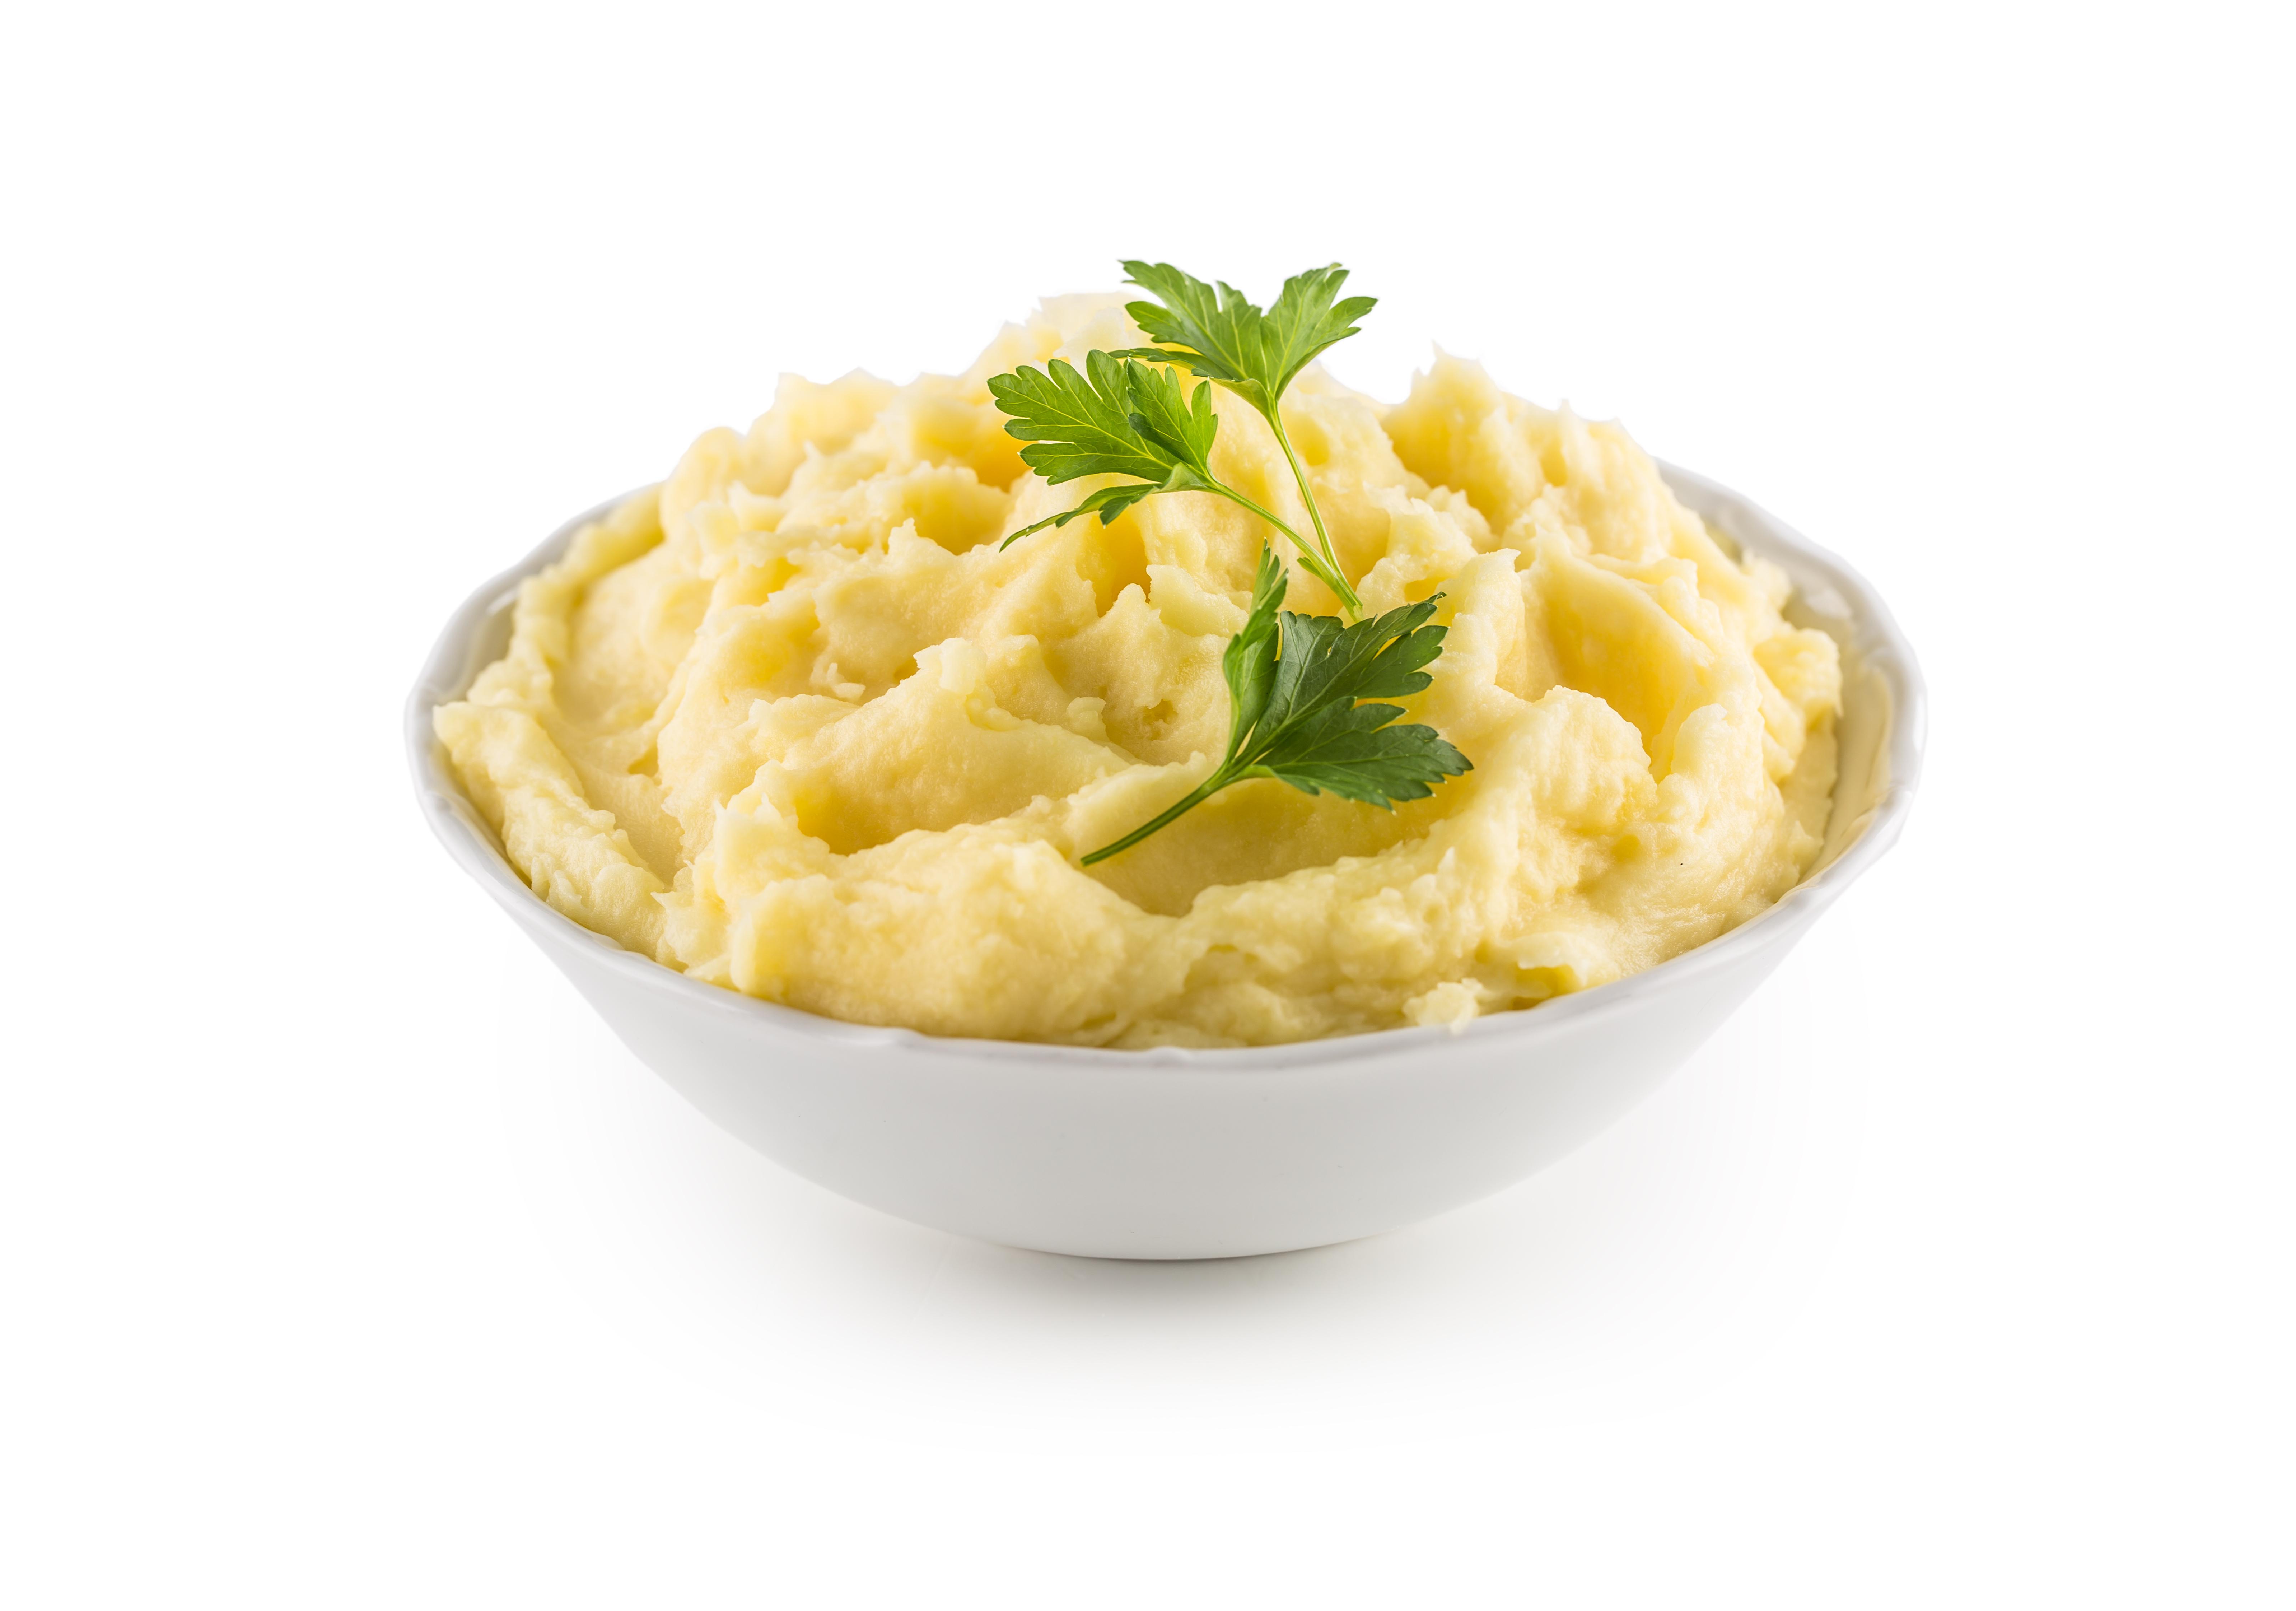 Prepared Mashed Potato